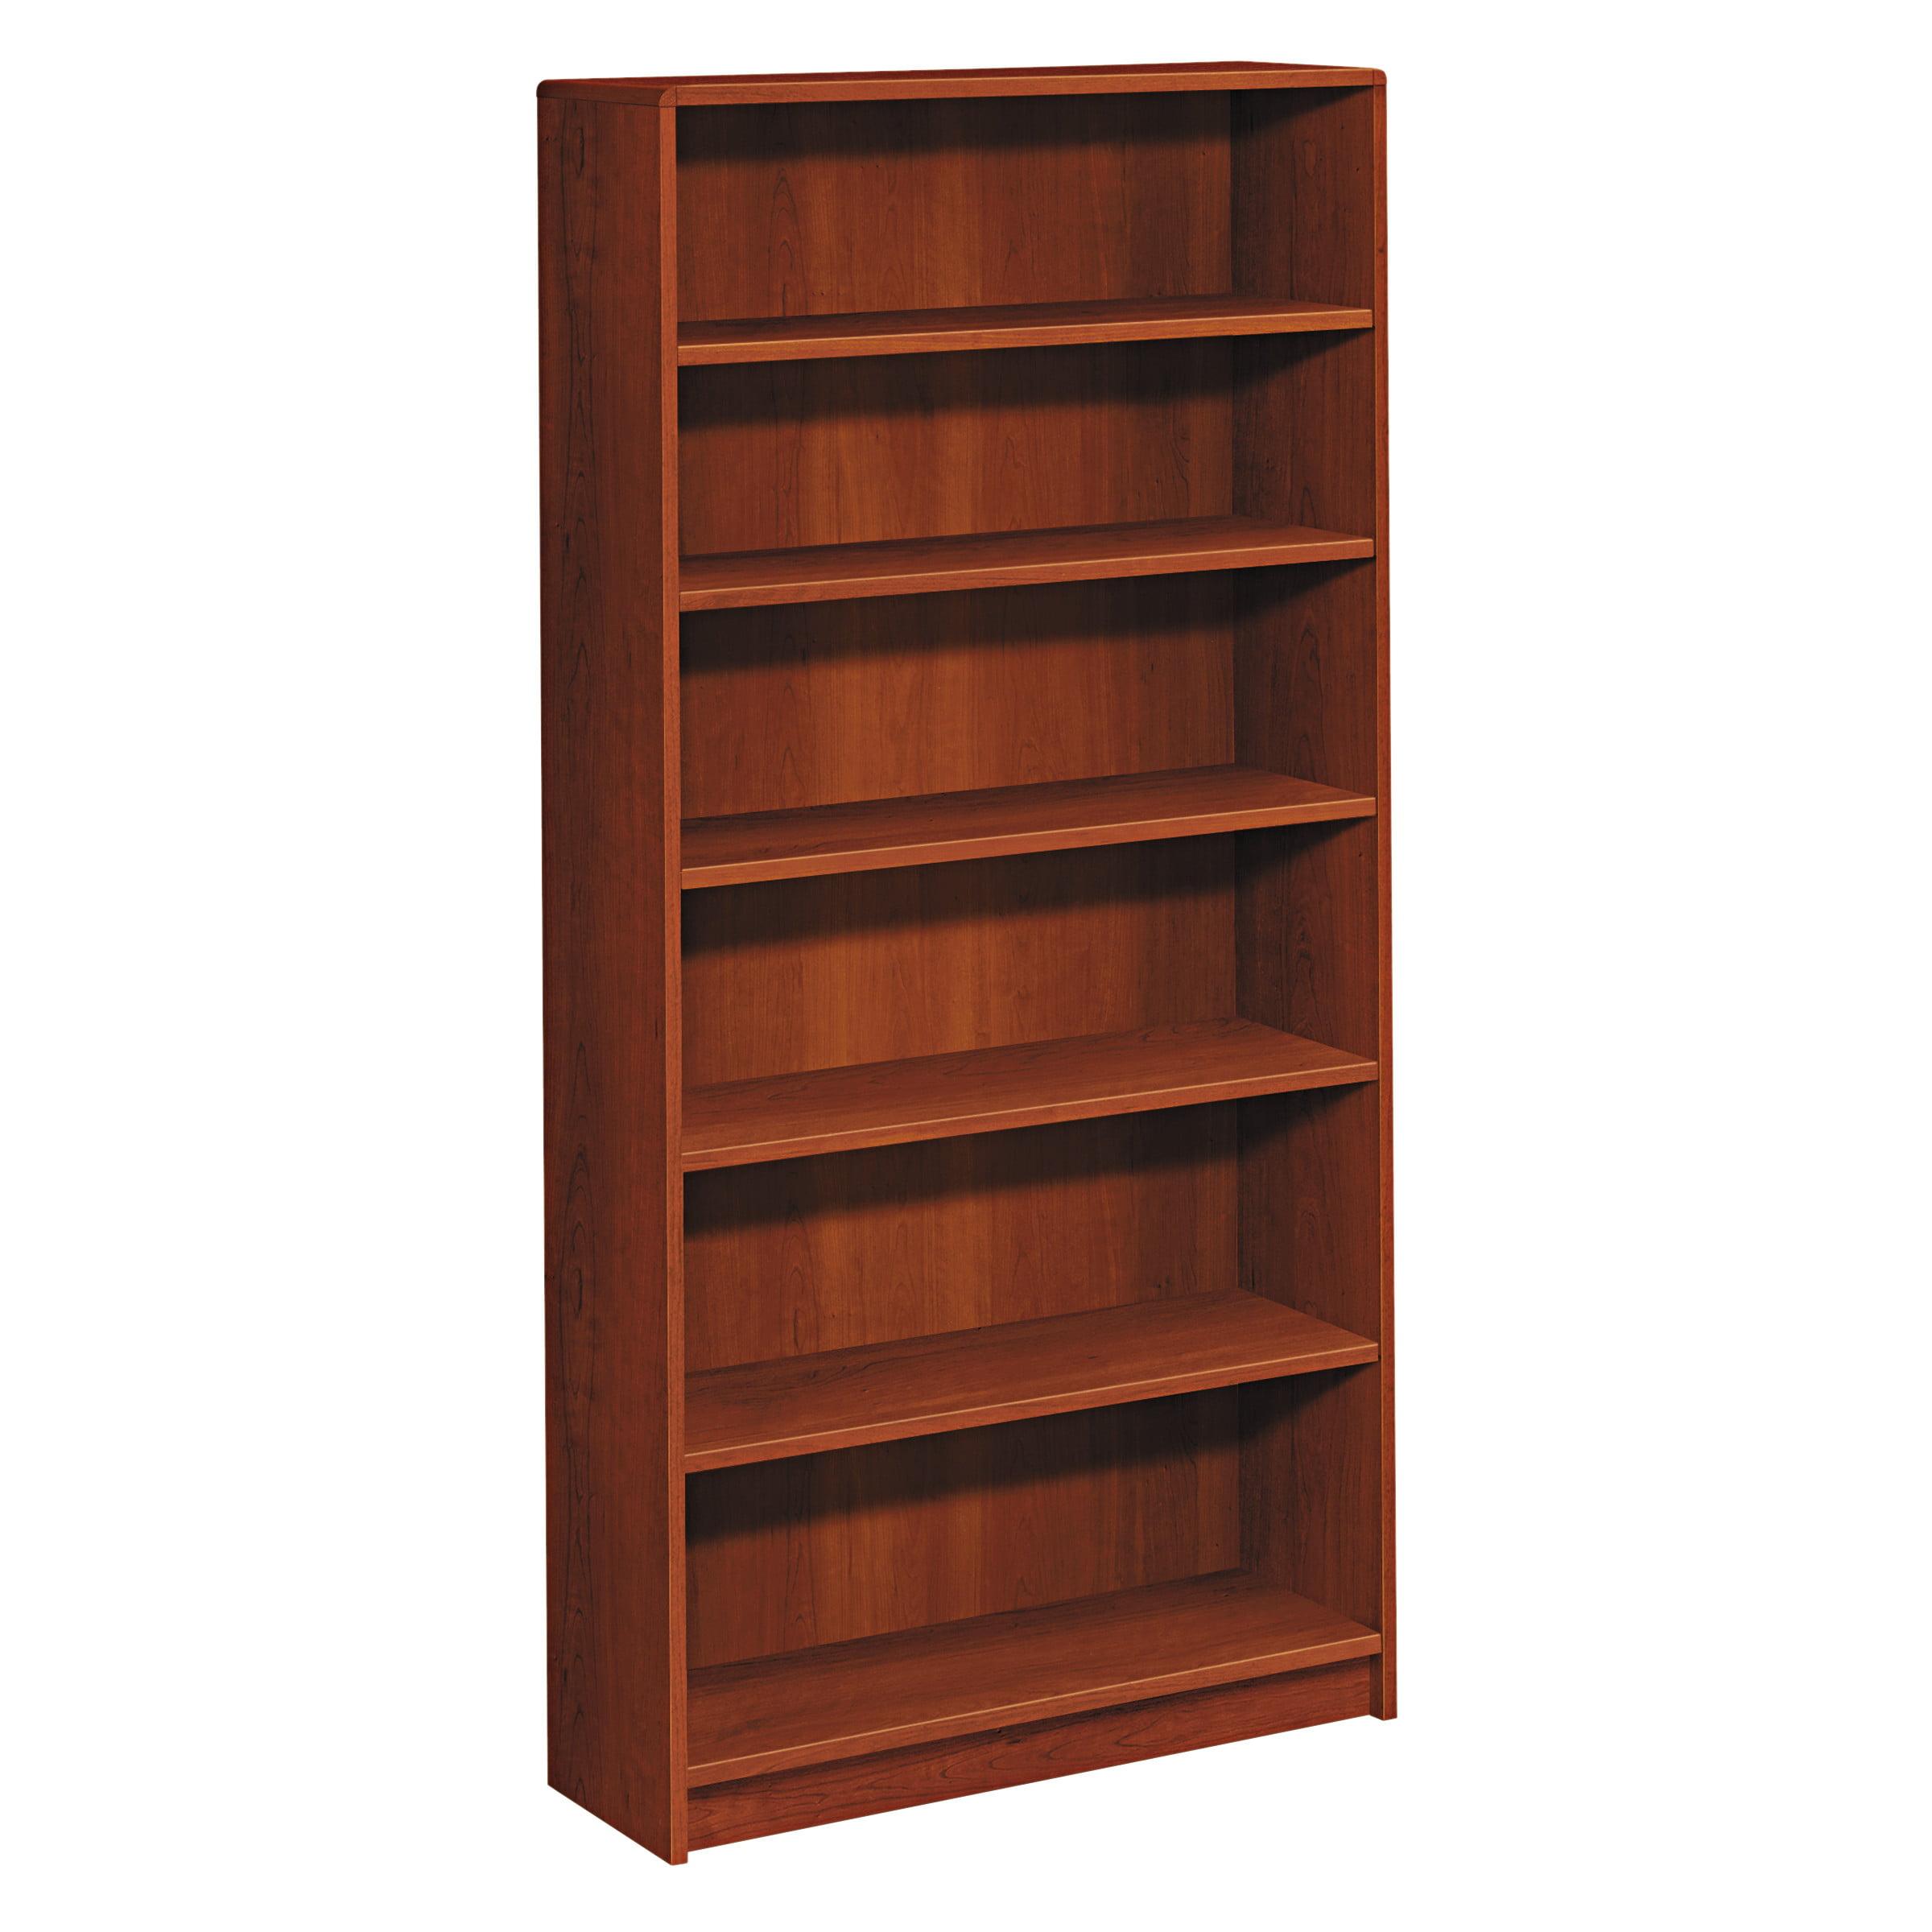 HON 1890 Series Bookcase, Six Shelf, 36w x 11 1/2d x 72 5/8h, Cognac